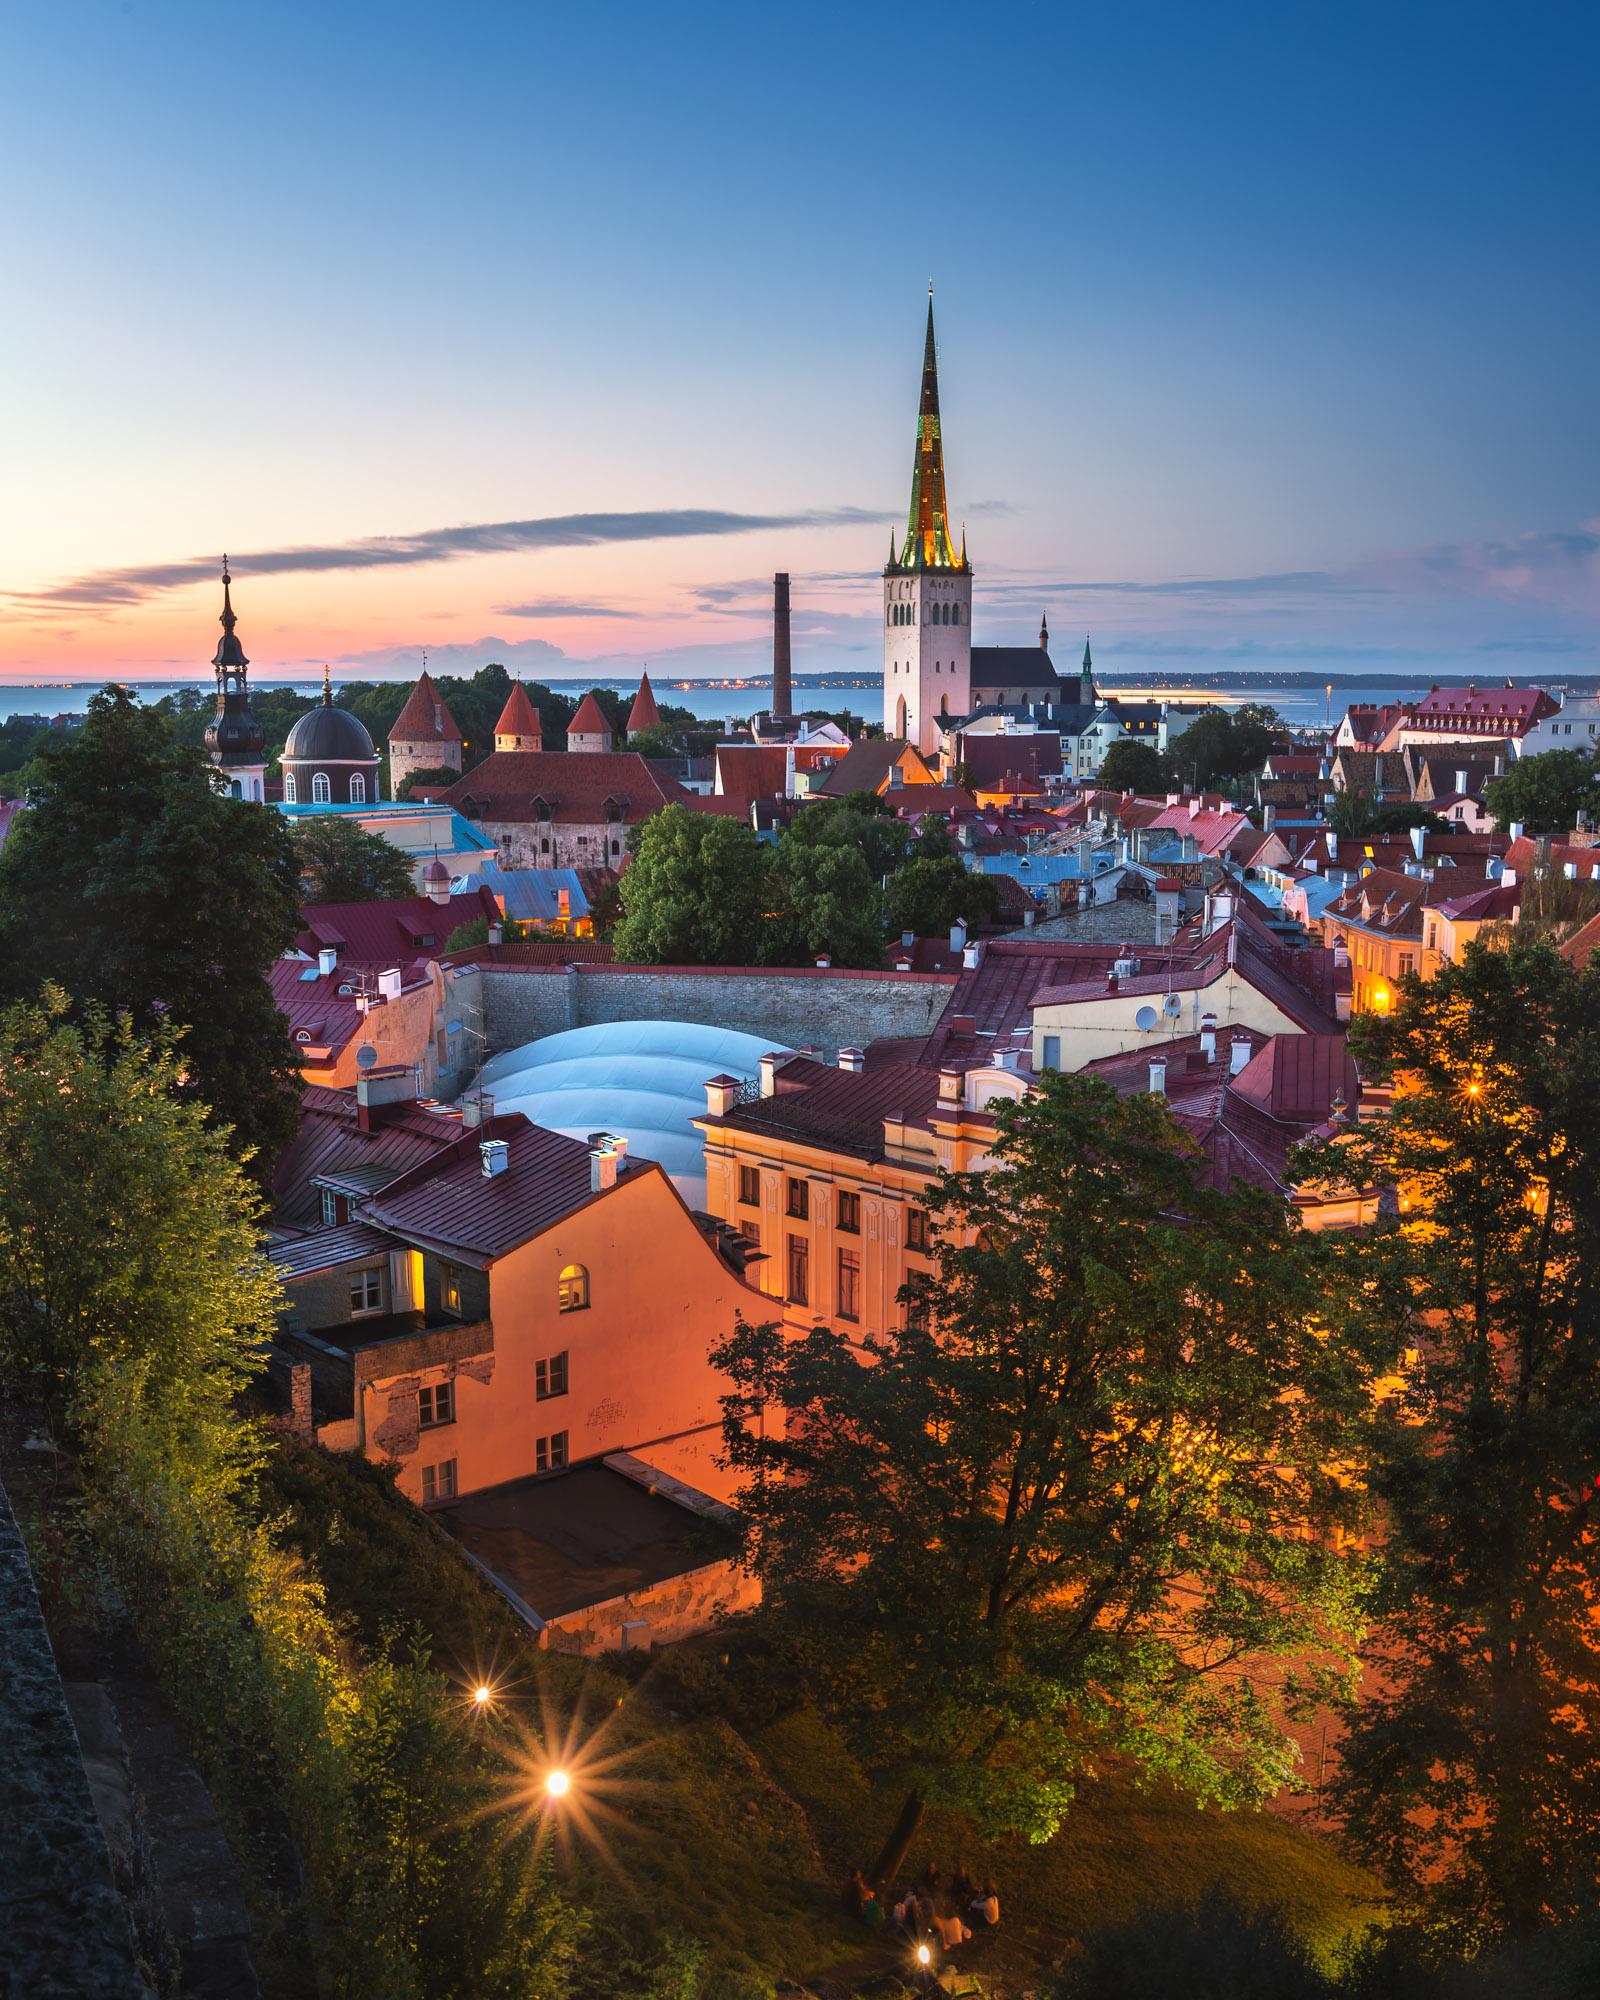 Aerial View of Tallinn Old Town, Tallinn, Estonia